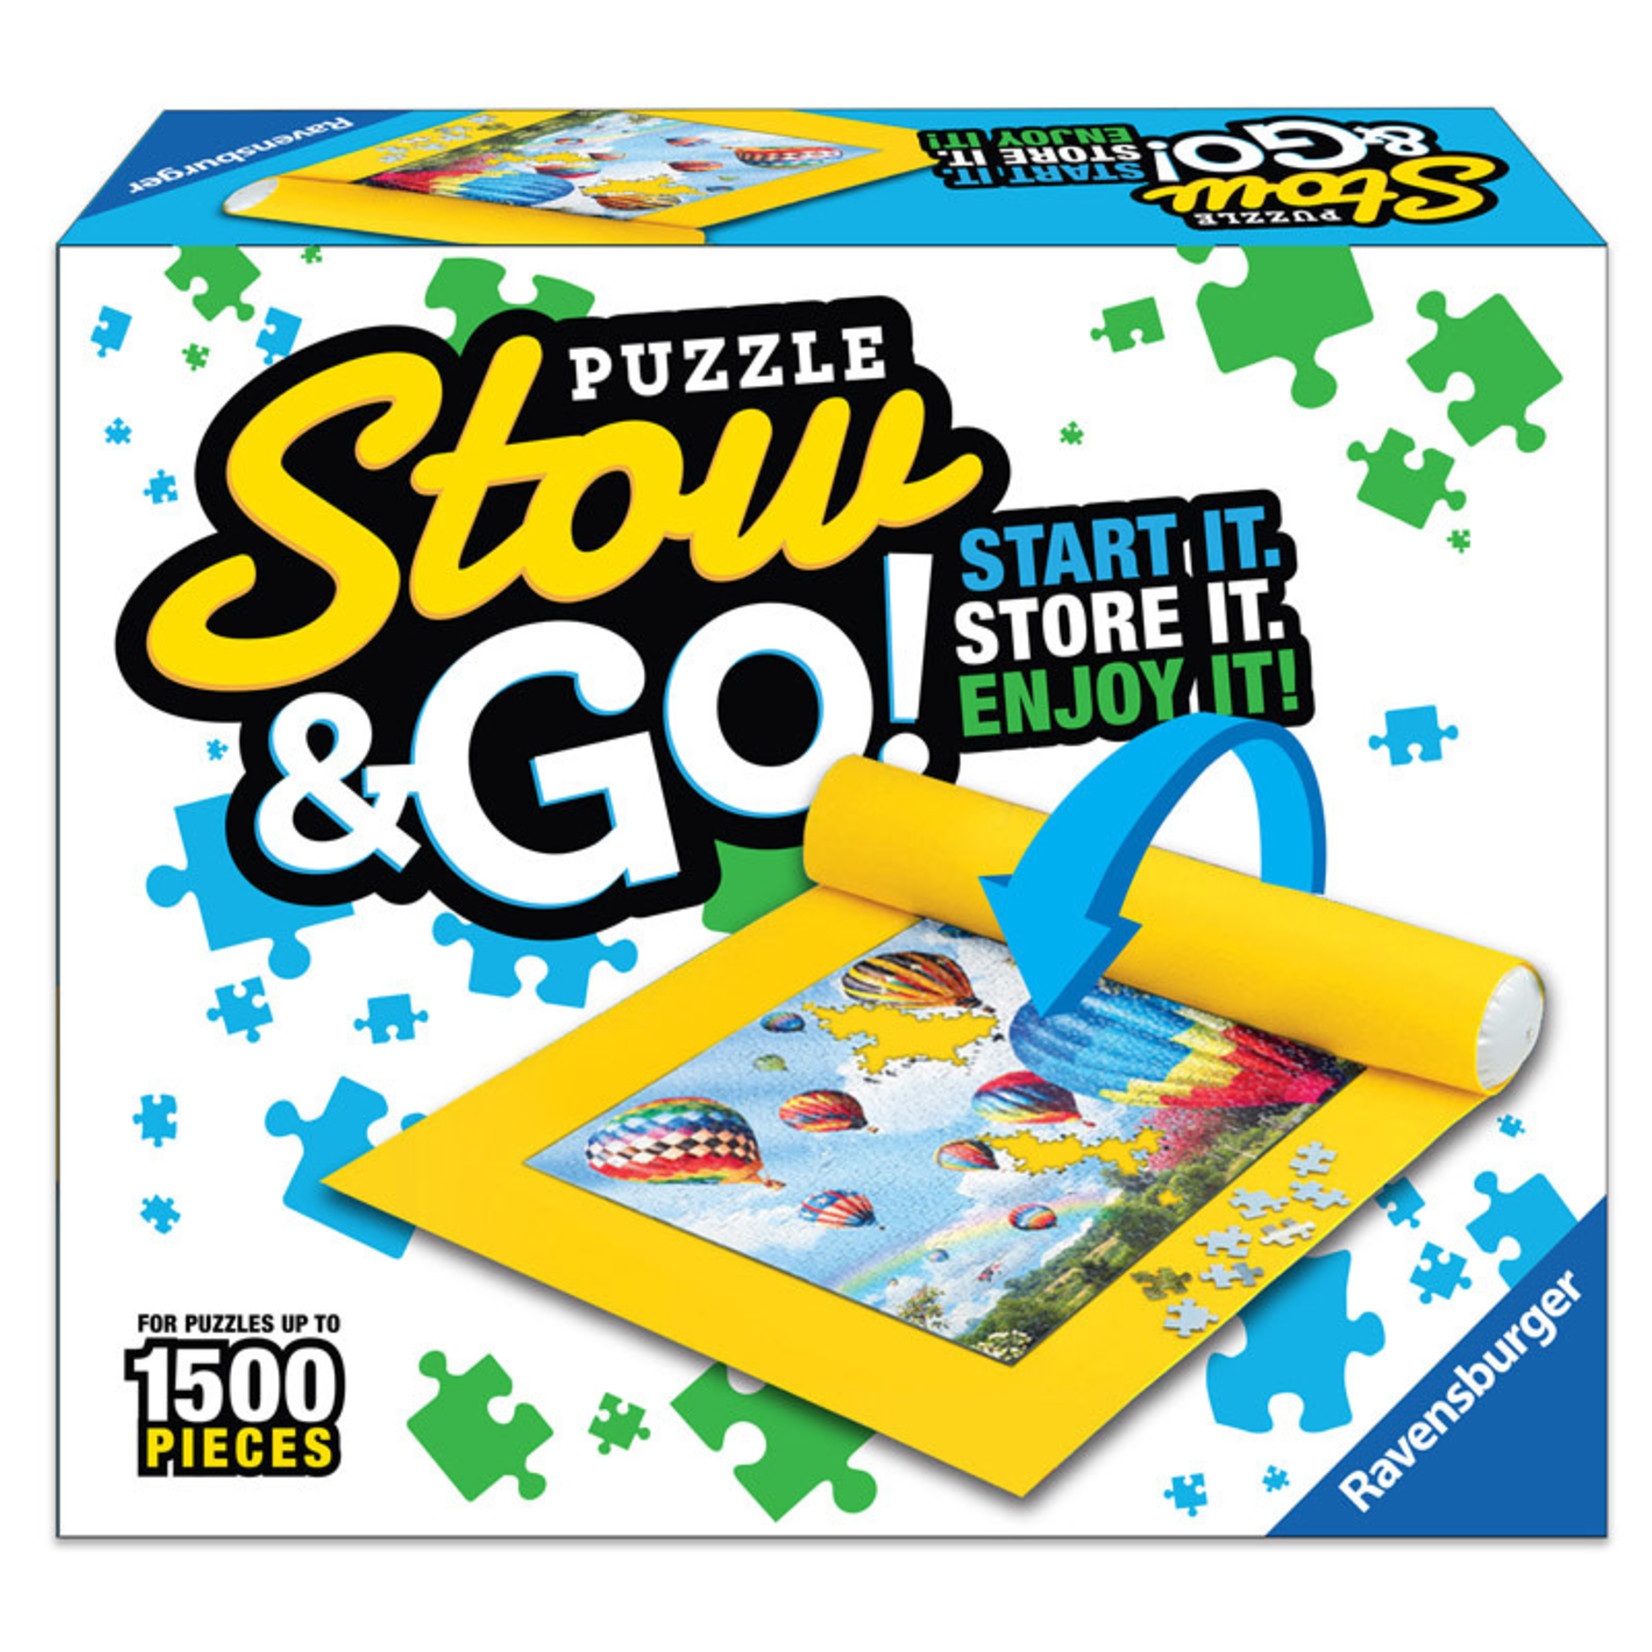 Ravensburger Puzzle Stow & Go